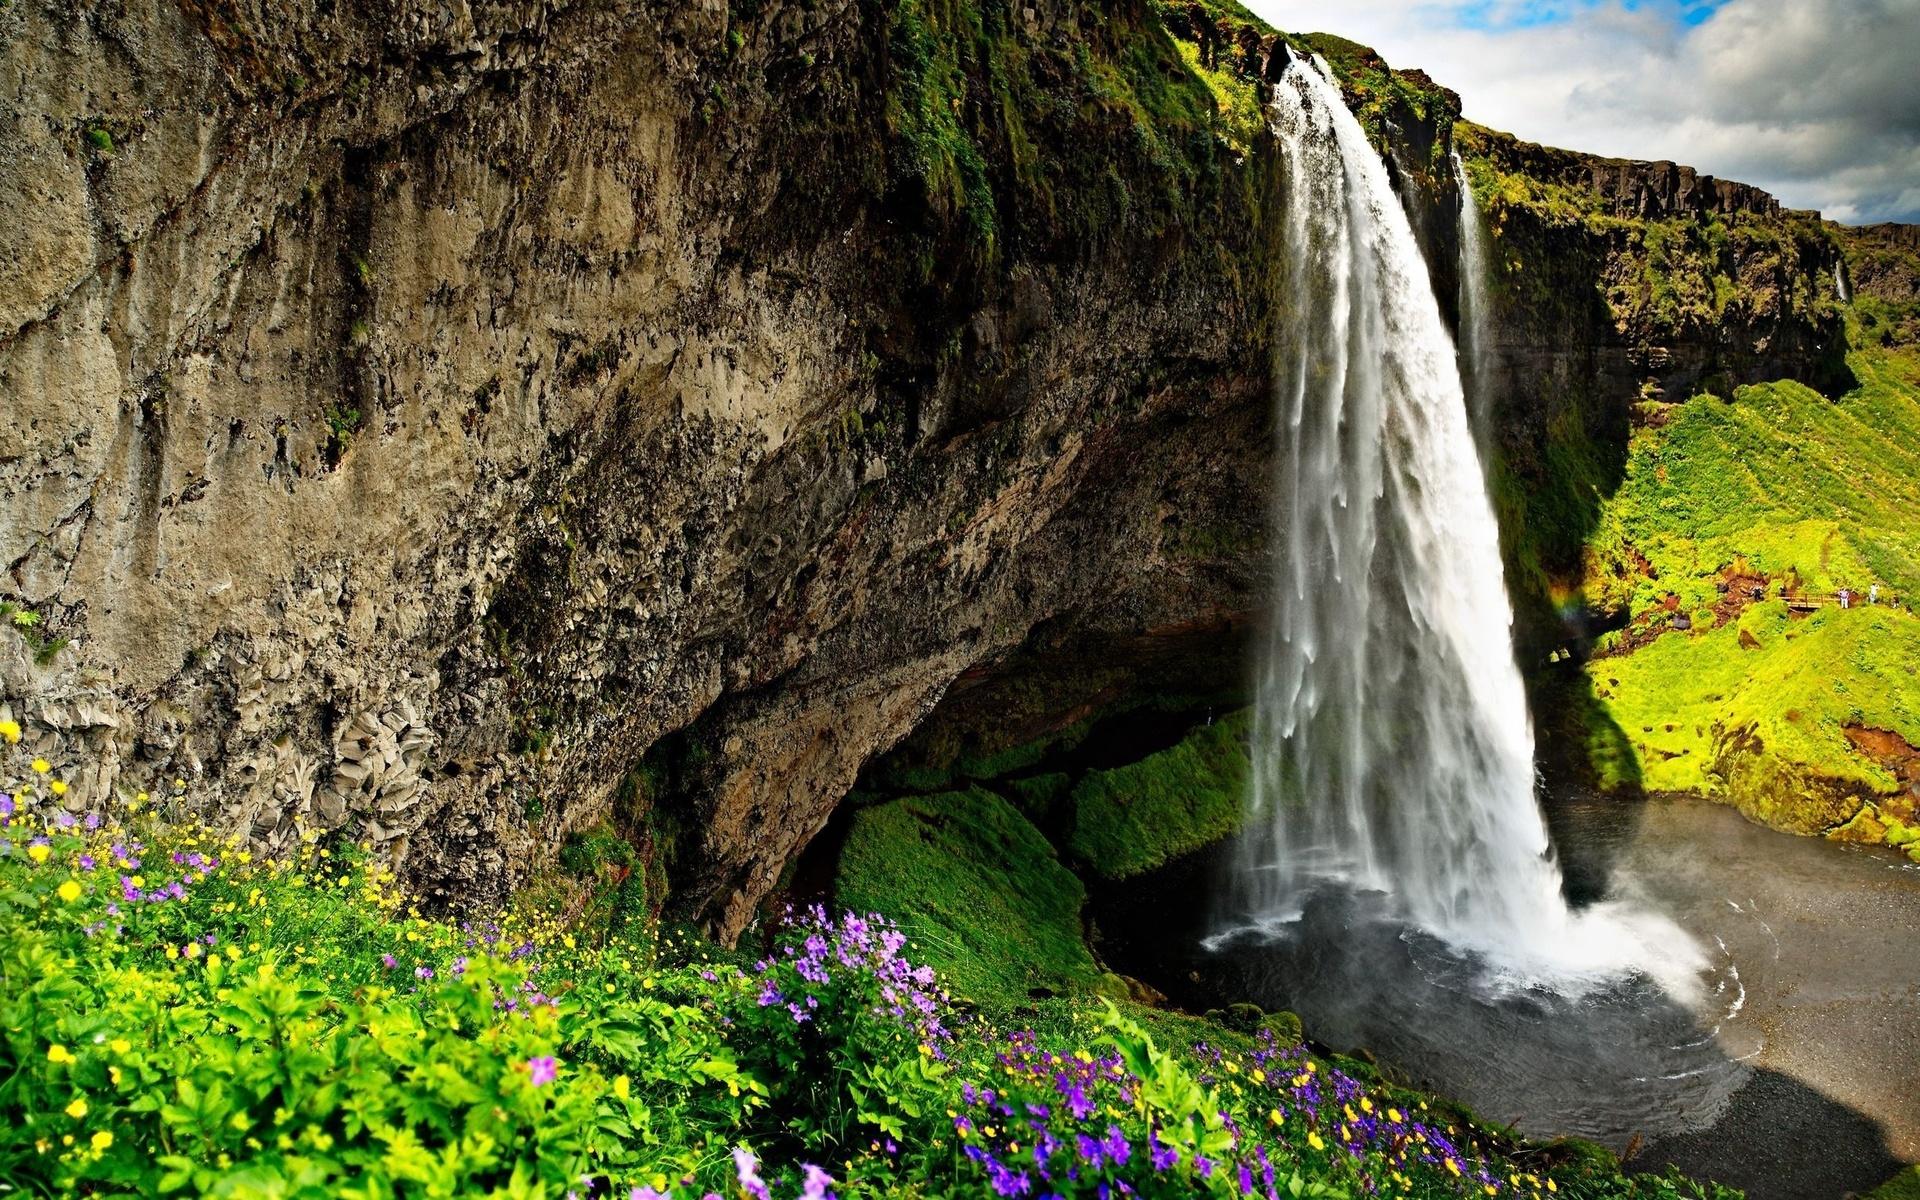 крещение картинки весна природа водопады виртуоз, которому